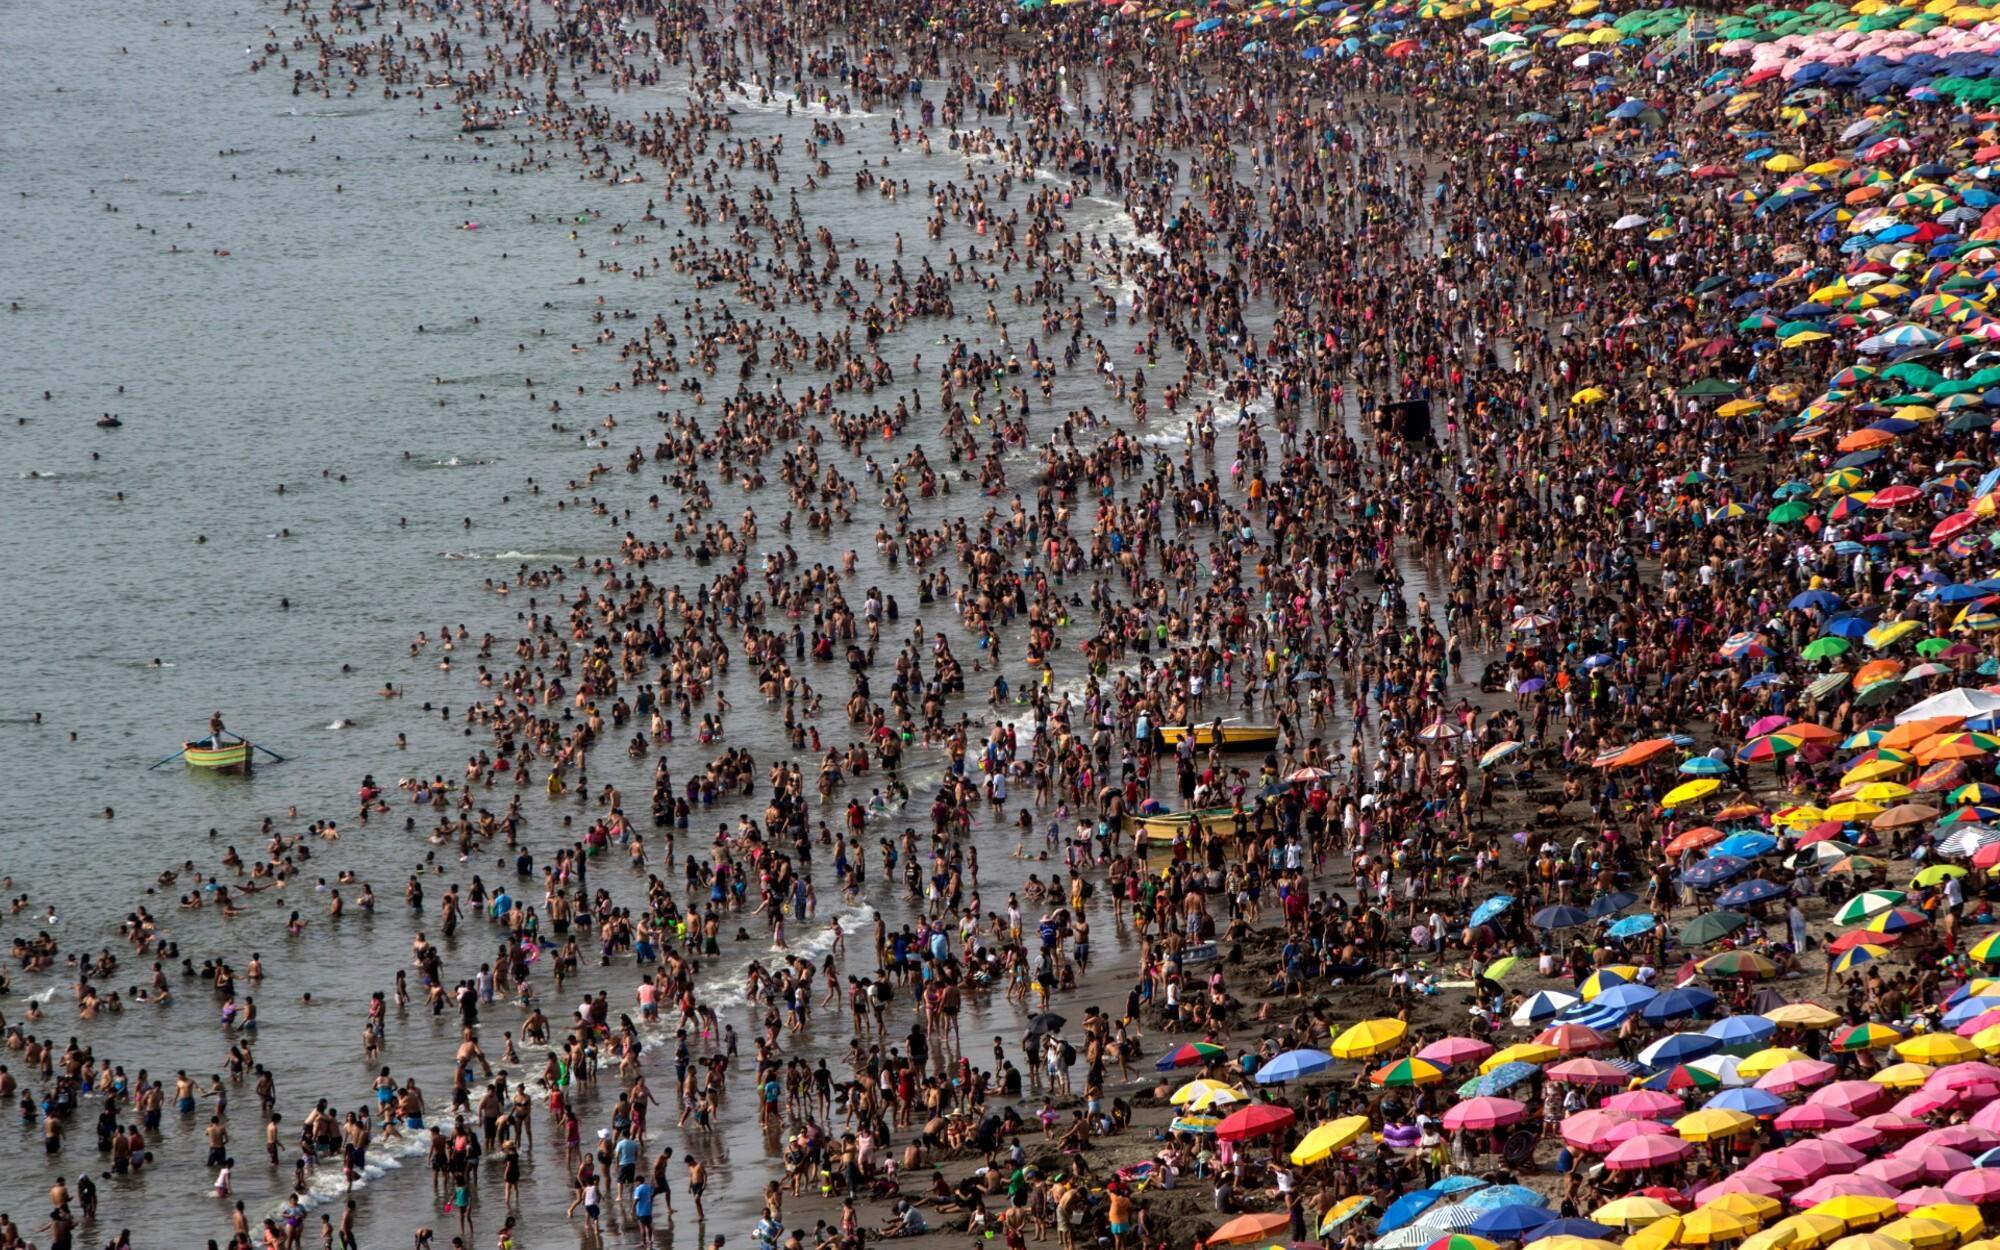 Photos: Birds claim Peru beach emptied by virus outbreak - Los Angeles Times